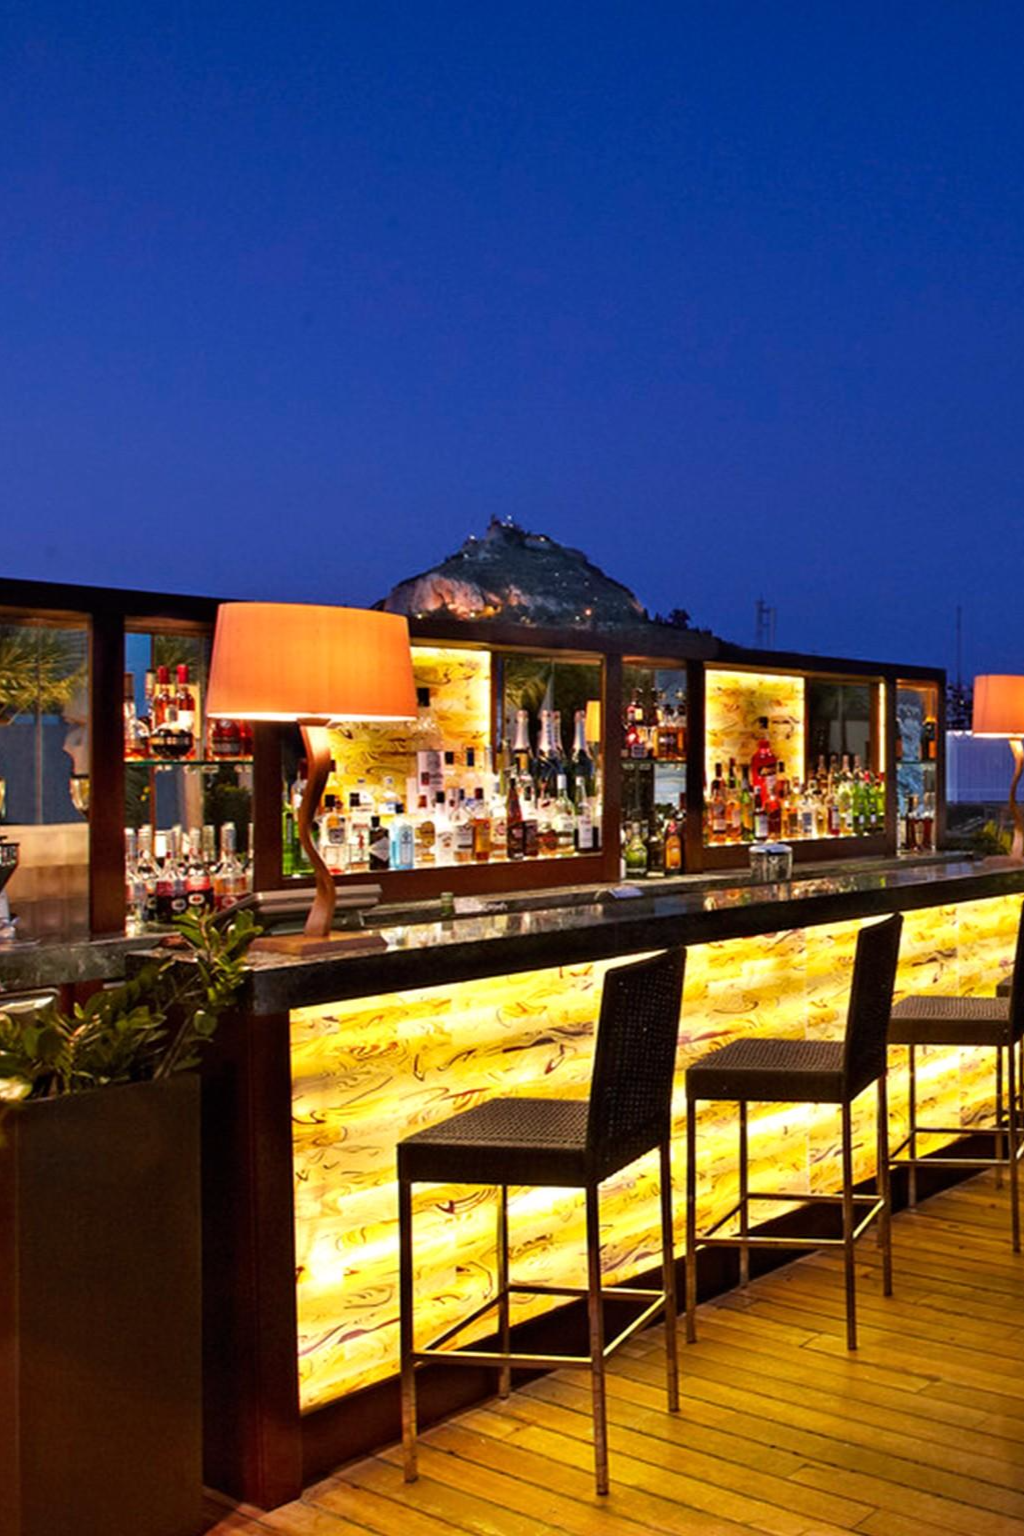 Enjoy A Cocktail Alfresco At The Hotel S Gb Roof Garden Bar Hotel Grande Bretagne A Luxury Collection Hotel Terrace Design Rooftop Terrace Design Garden Bar